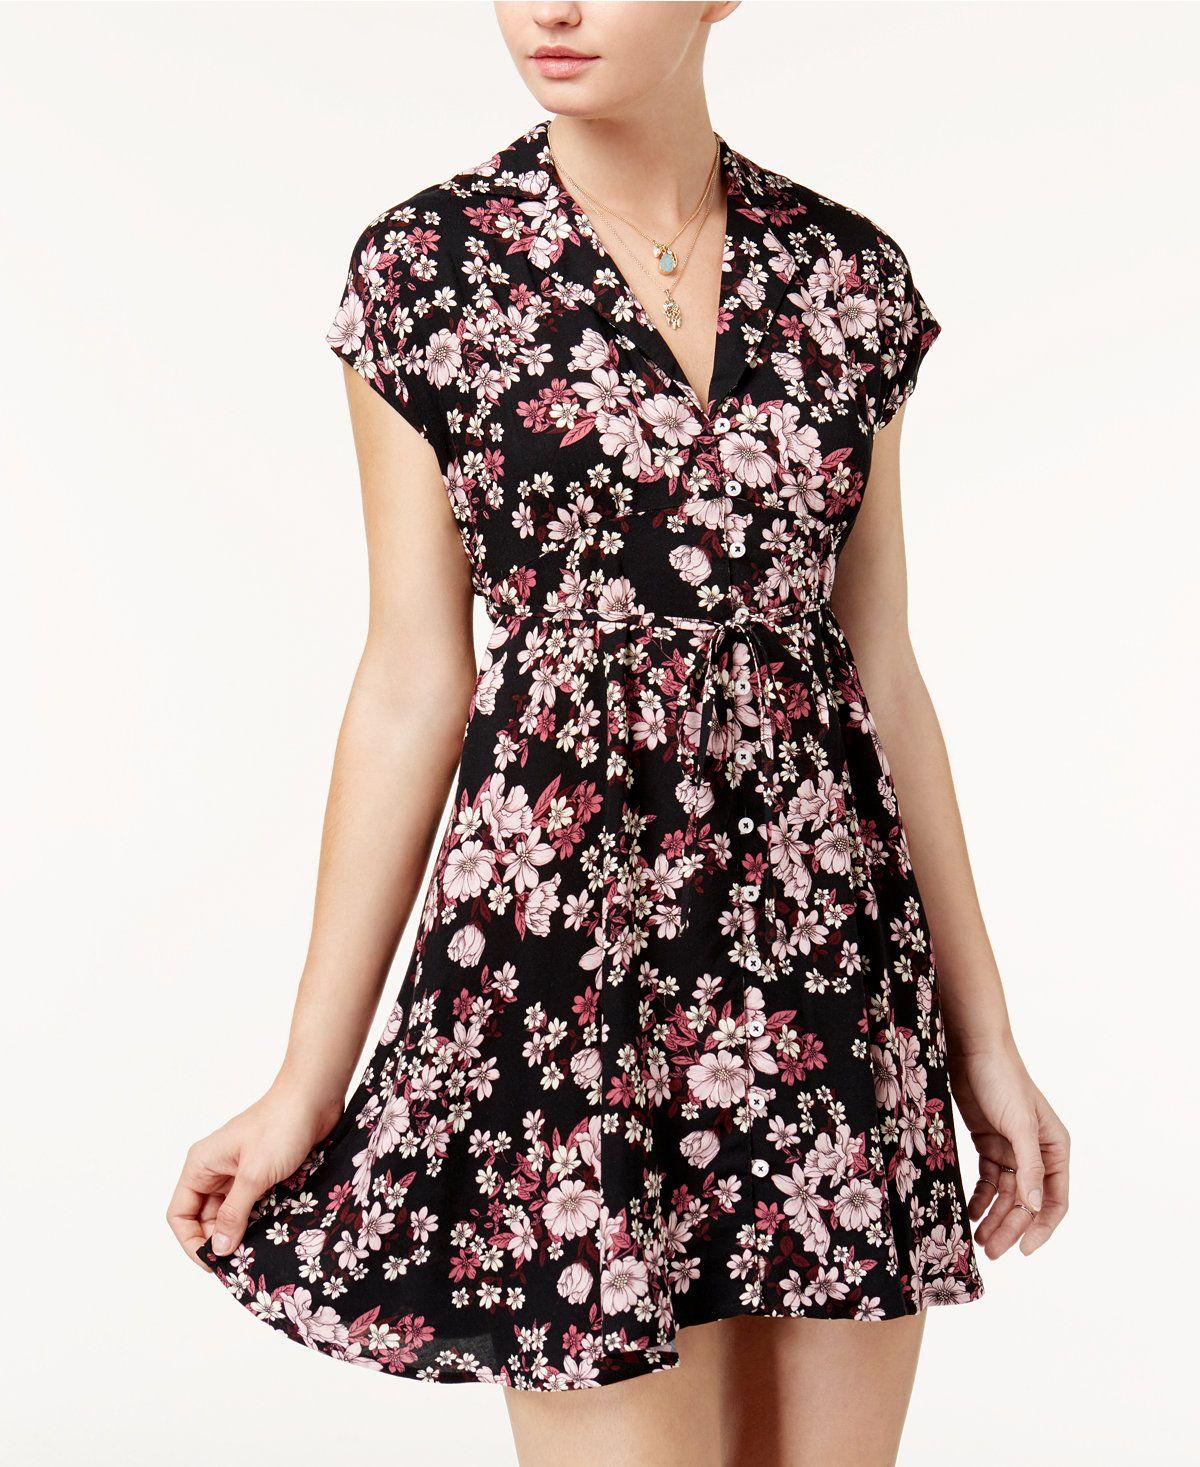 97649358b2ff American Rag Juniors  Floral-Print Shirtdress